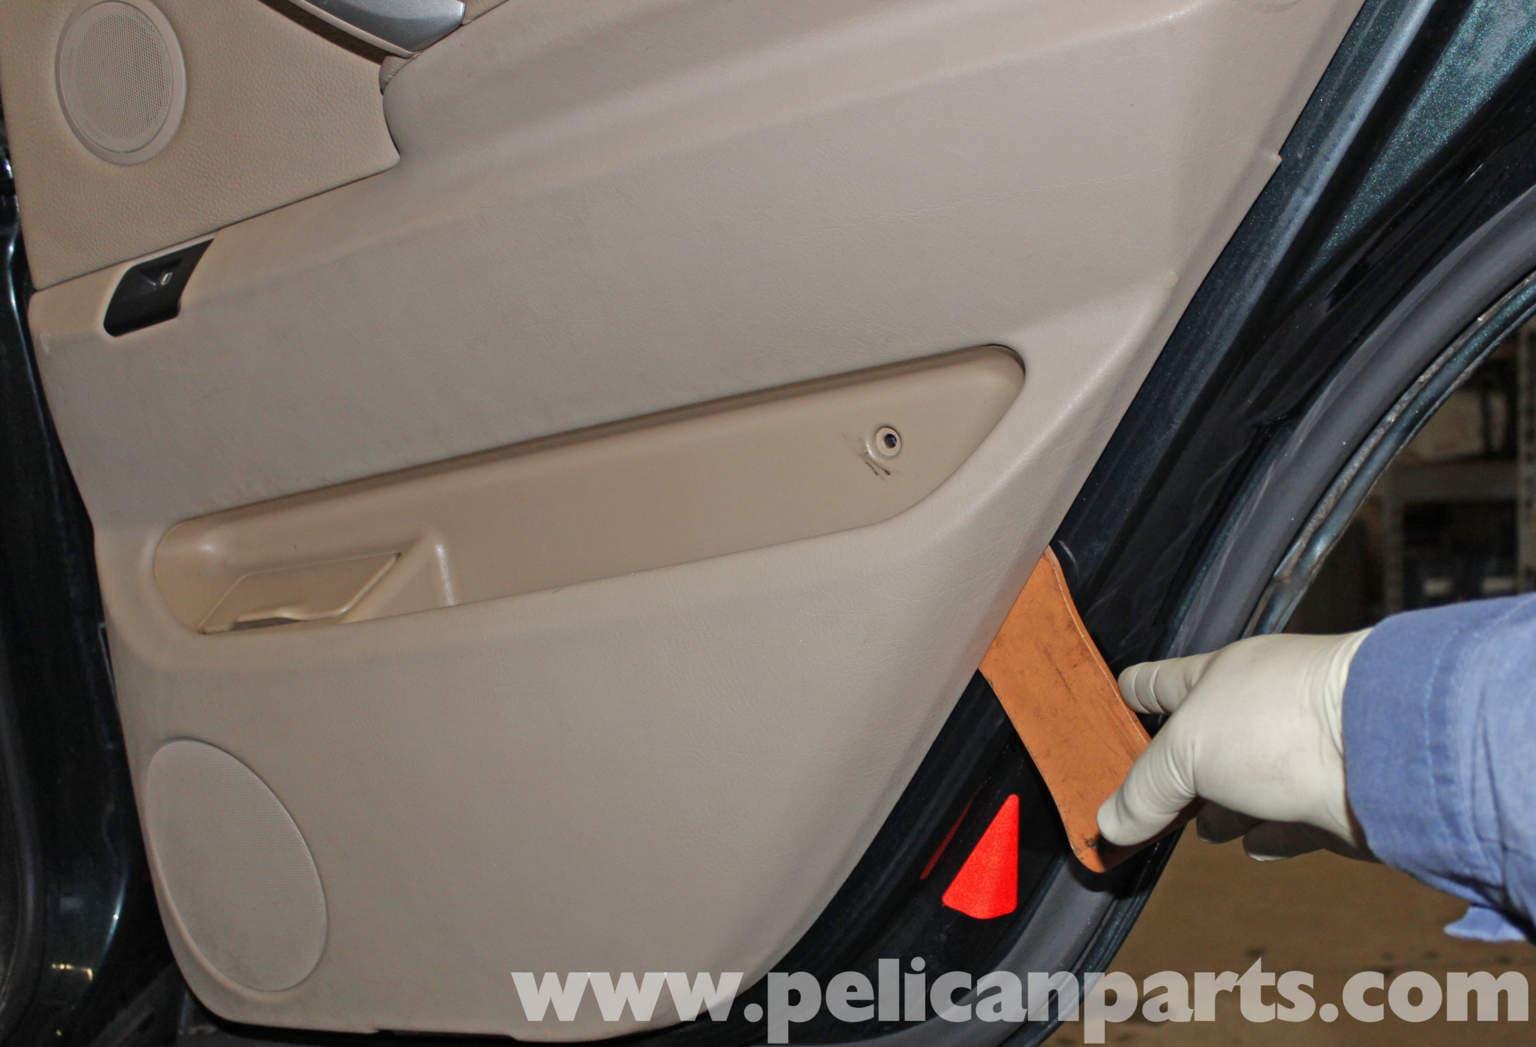 Bmw X5 Rear Door Panel Replacement E53 2000 2006 Pelican Parts Diy Maintenance Article